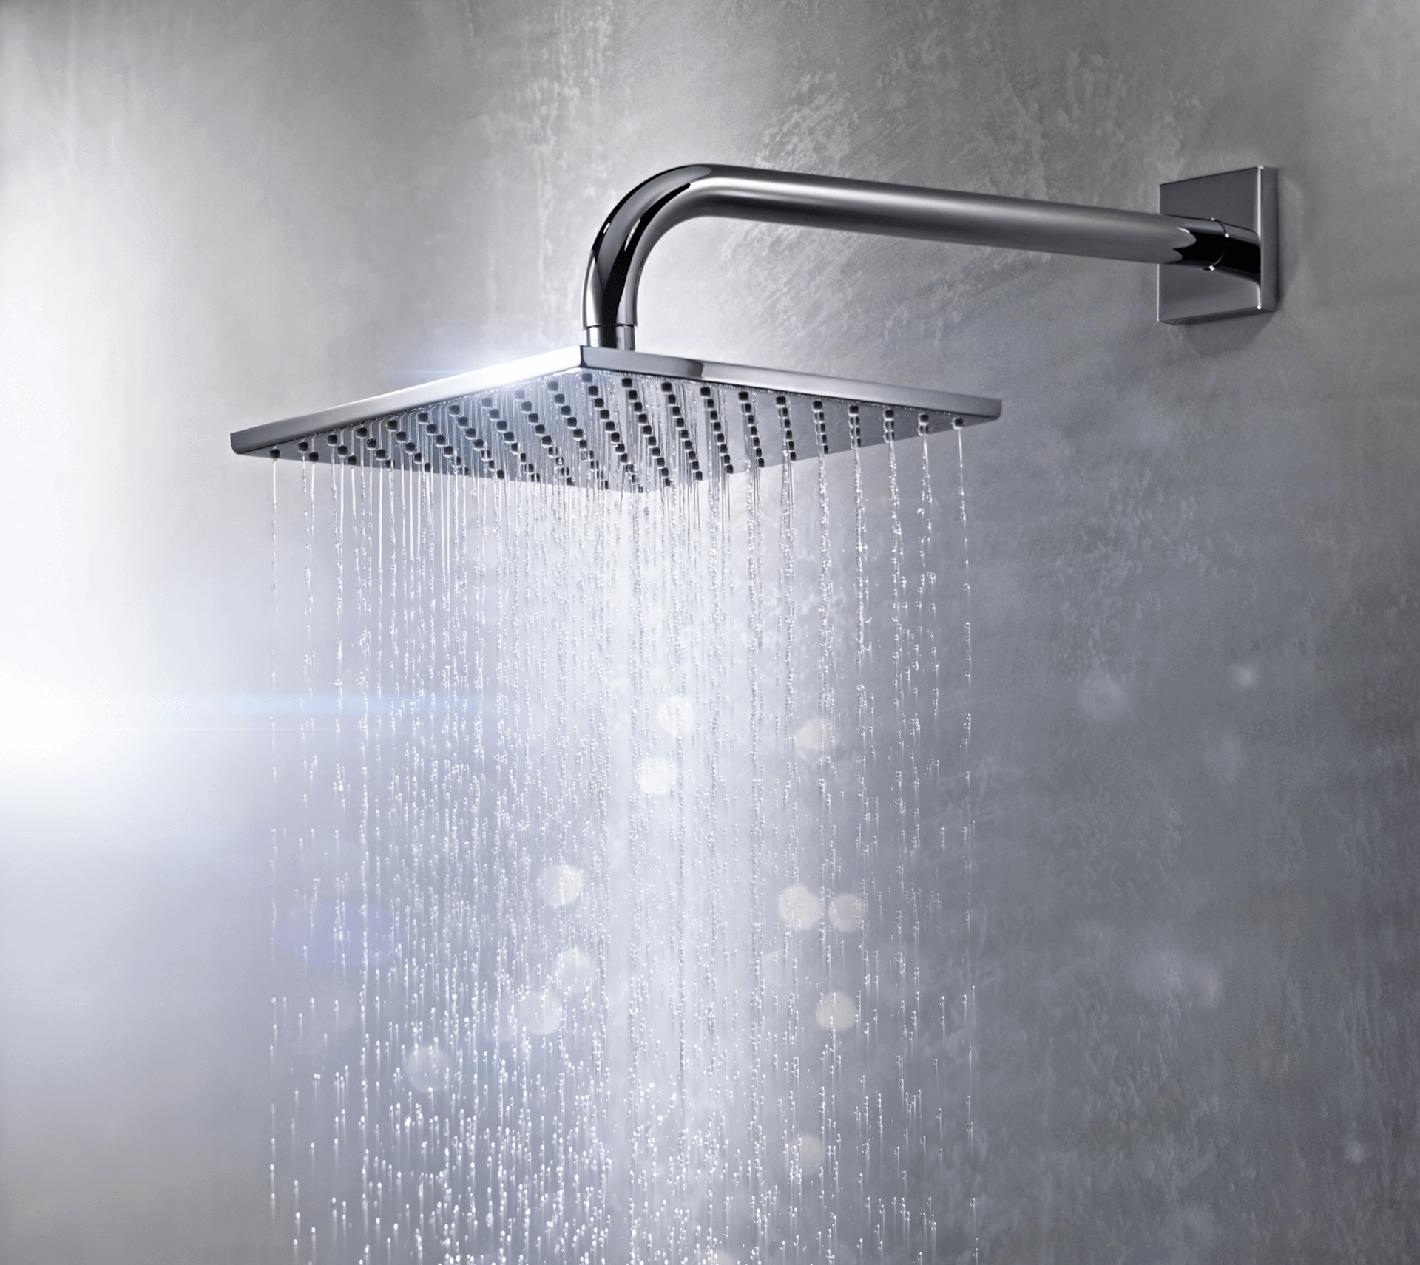 Cobra Square Rain Shower Head 200 x 145mm Chrome-Plated - Cobra